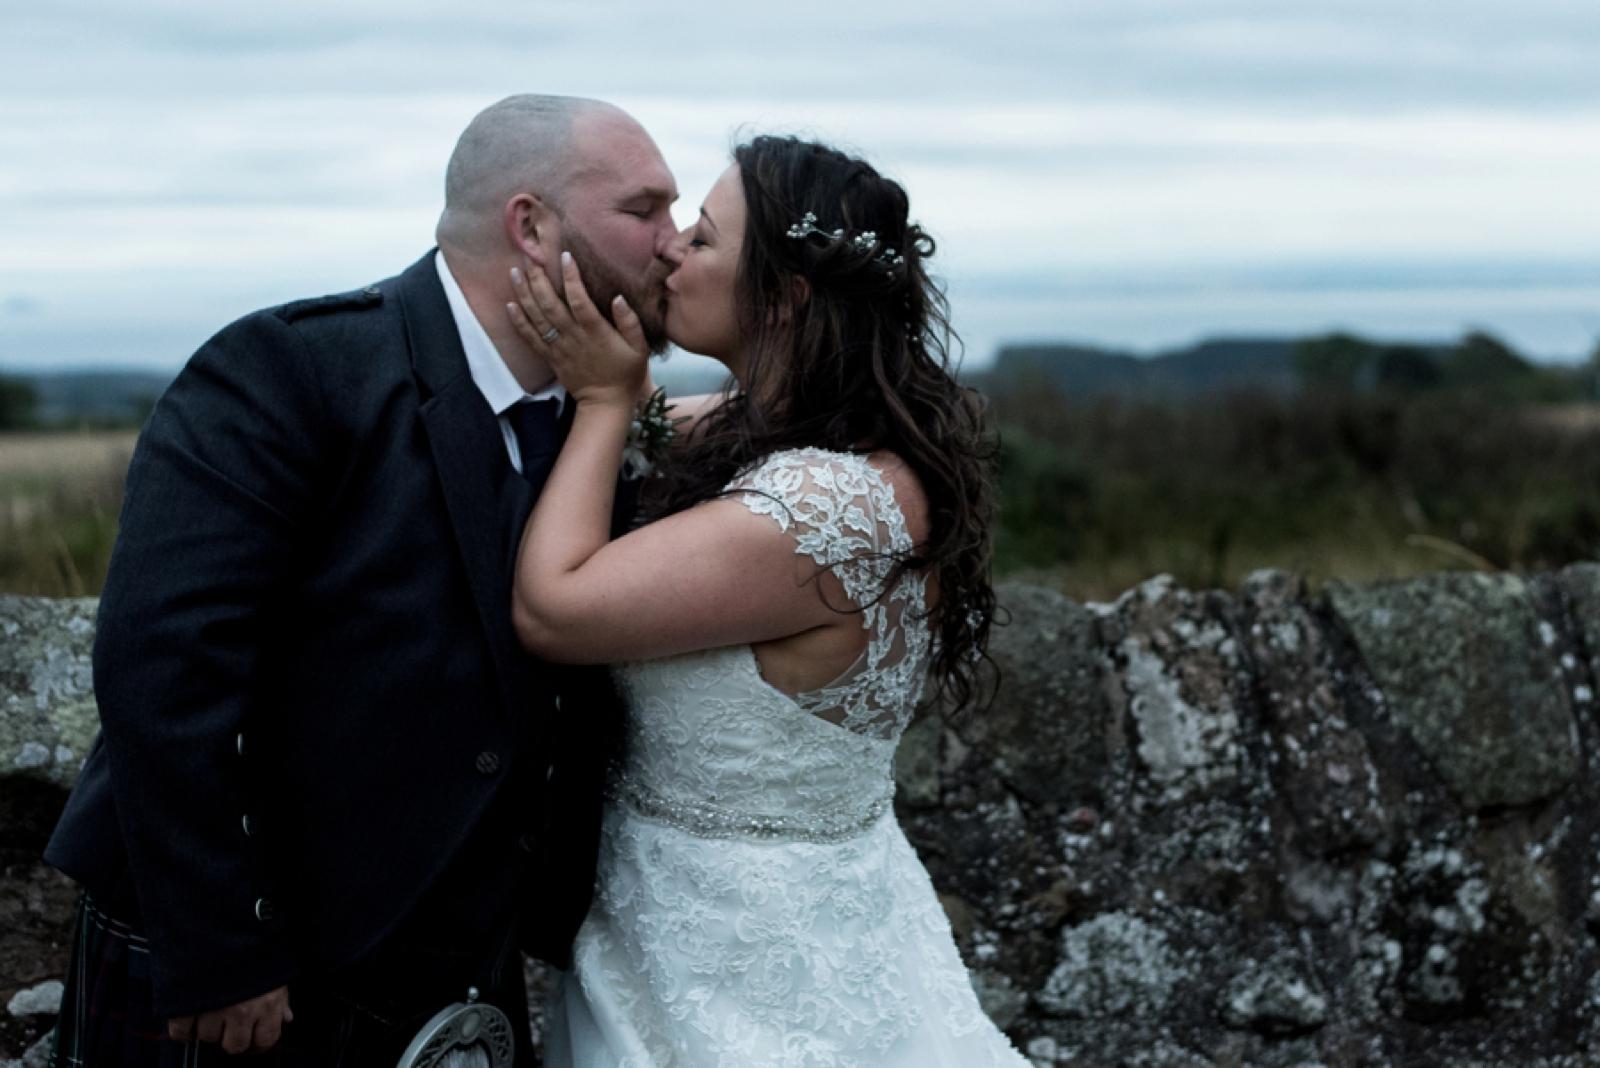 2017-09-23 (Mearns) Pratis Farm Wedding Photography190454.jpg